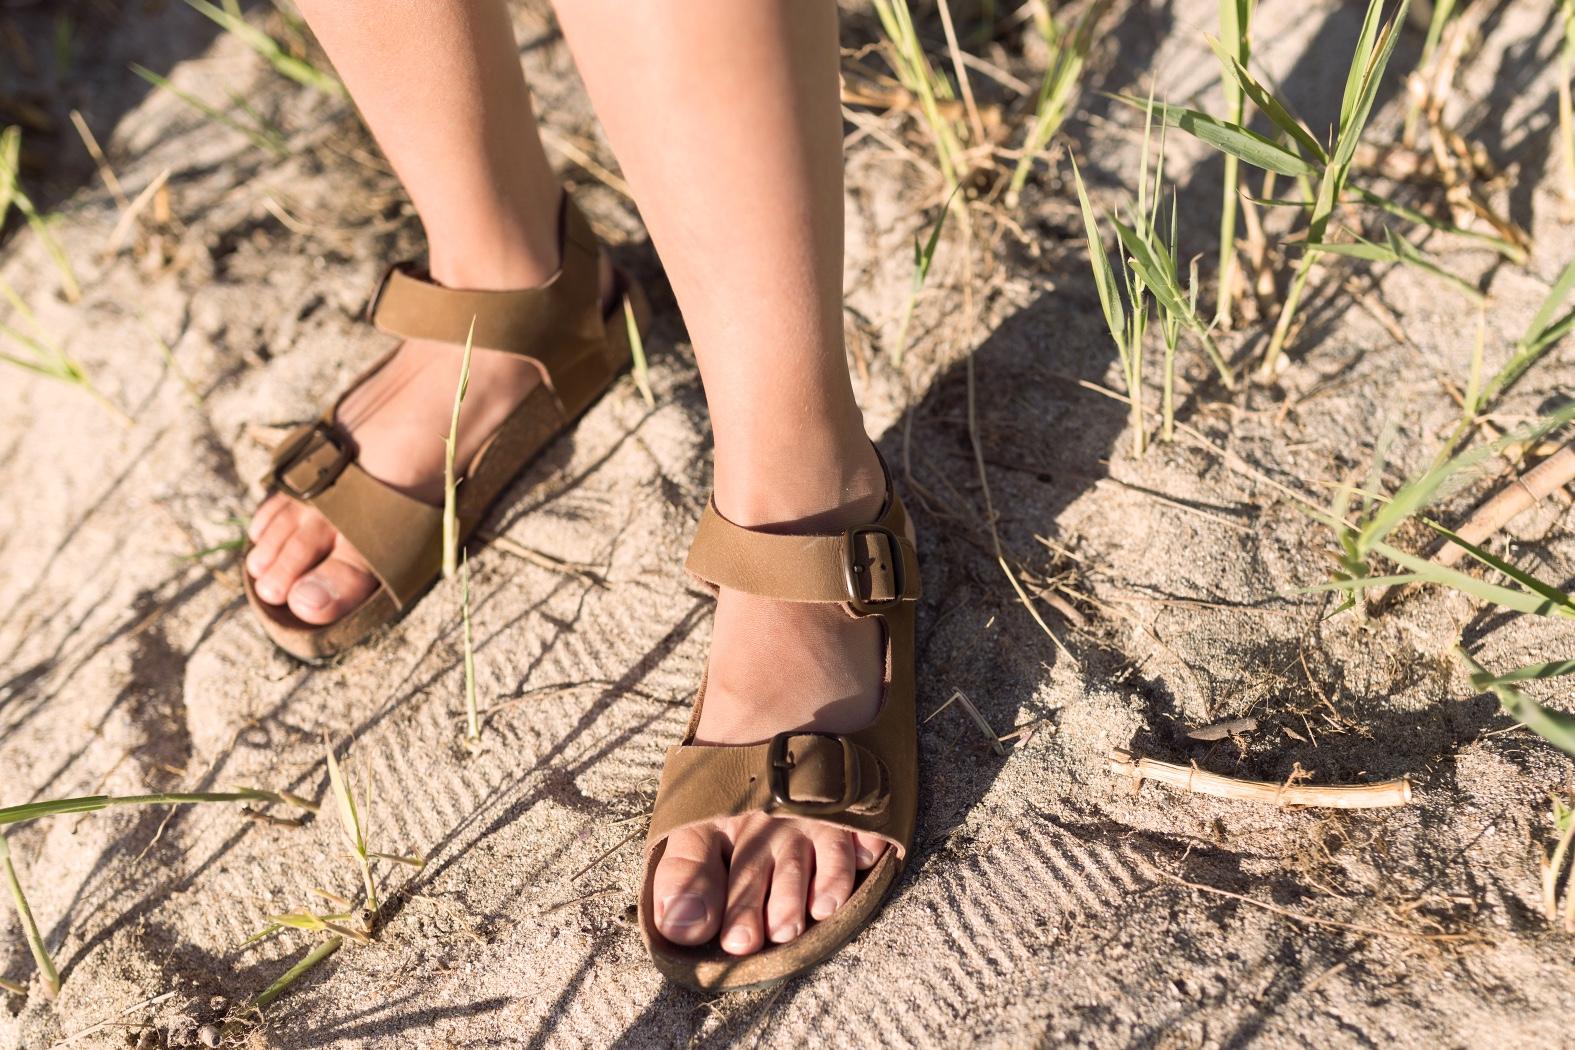 stylelovely-descalzaporelparque-ZARA -Mango Kids-Zippy-ZARA KIDS-rayban-una auténtica aventura-jimena-playa-style-fashion-lifestyle-coruña-bloggers